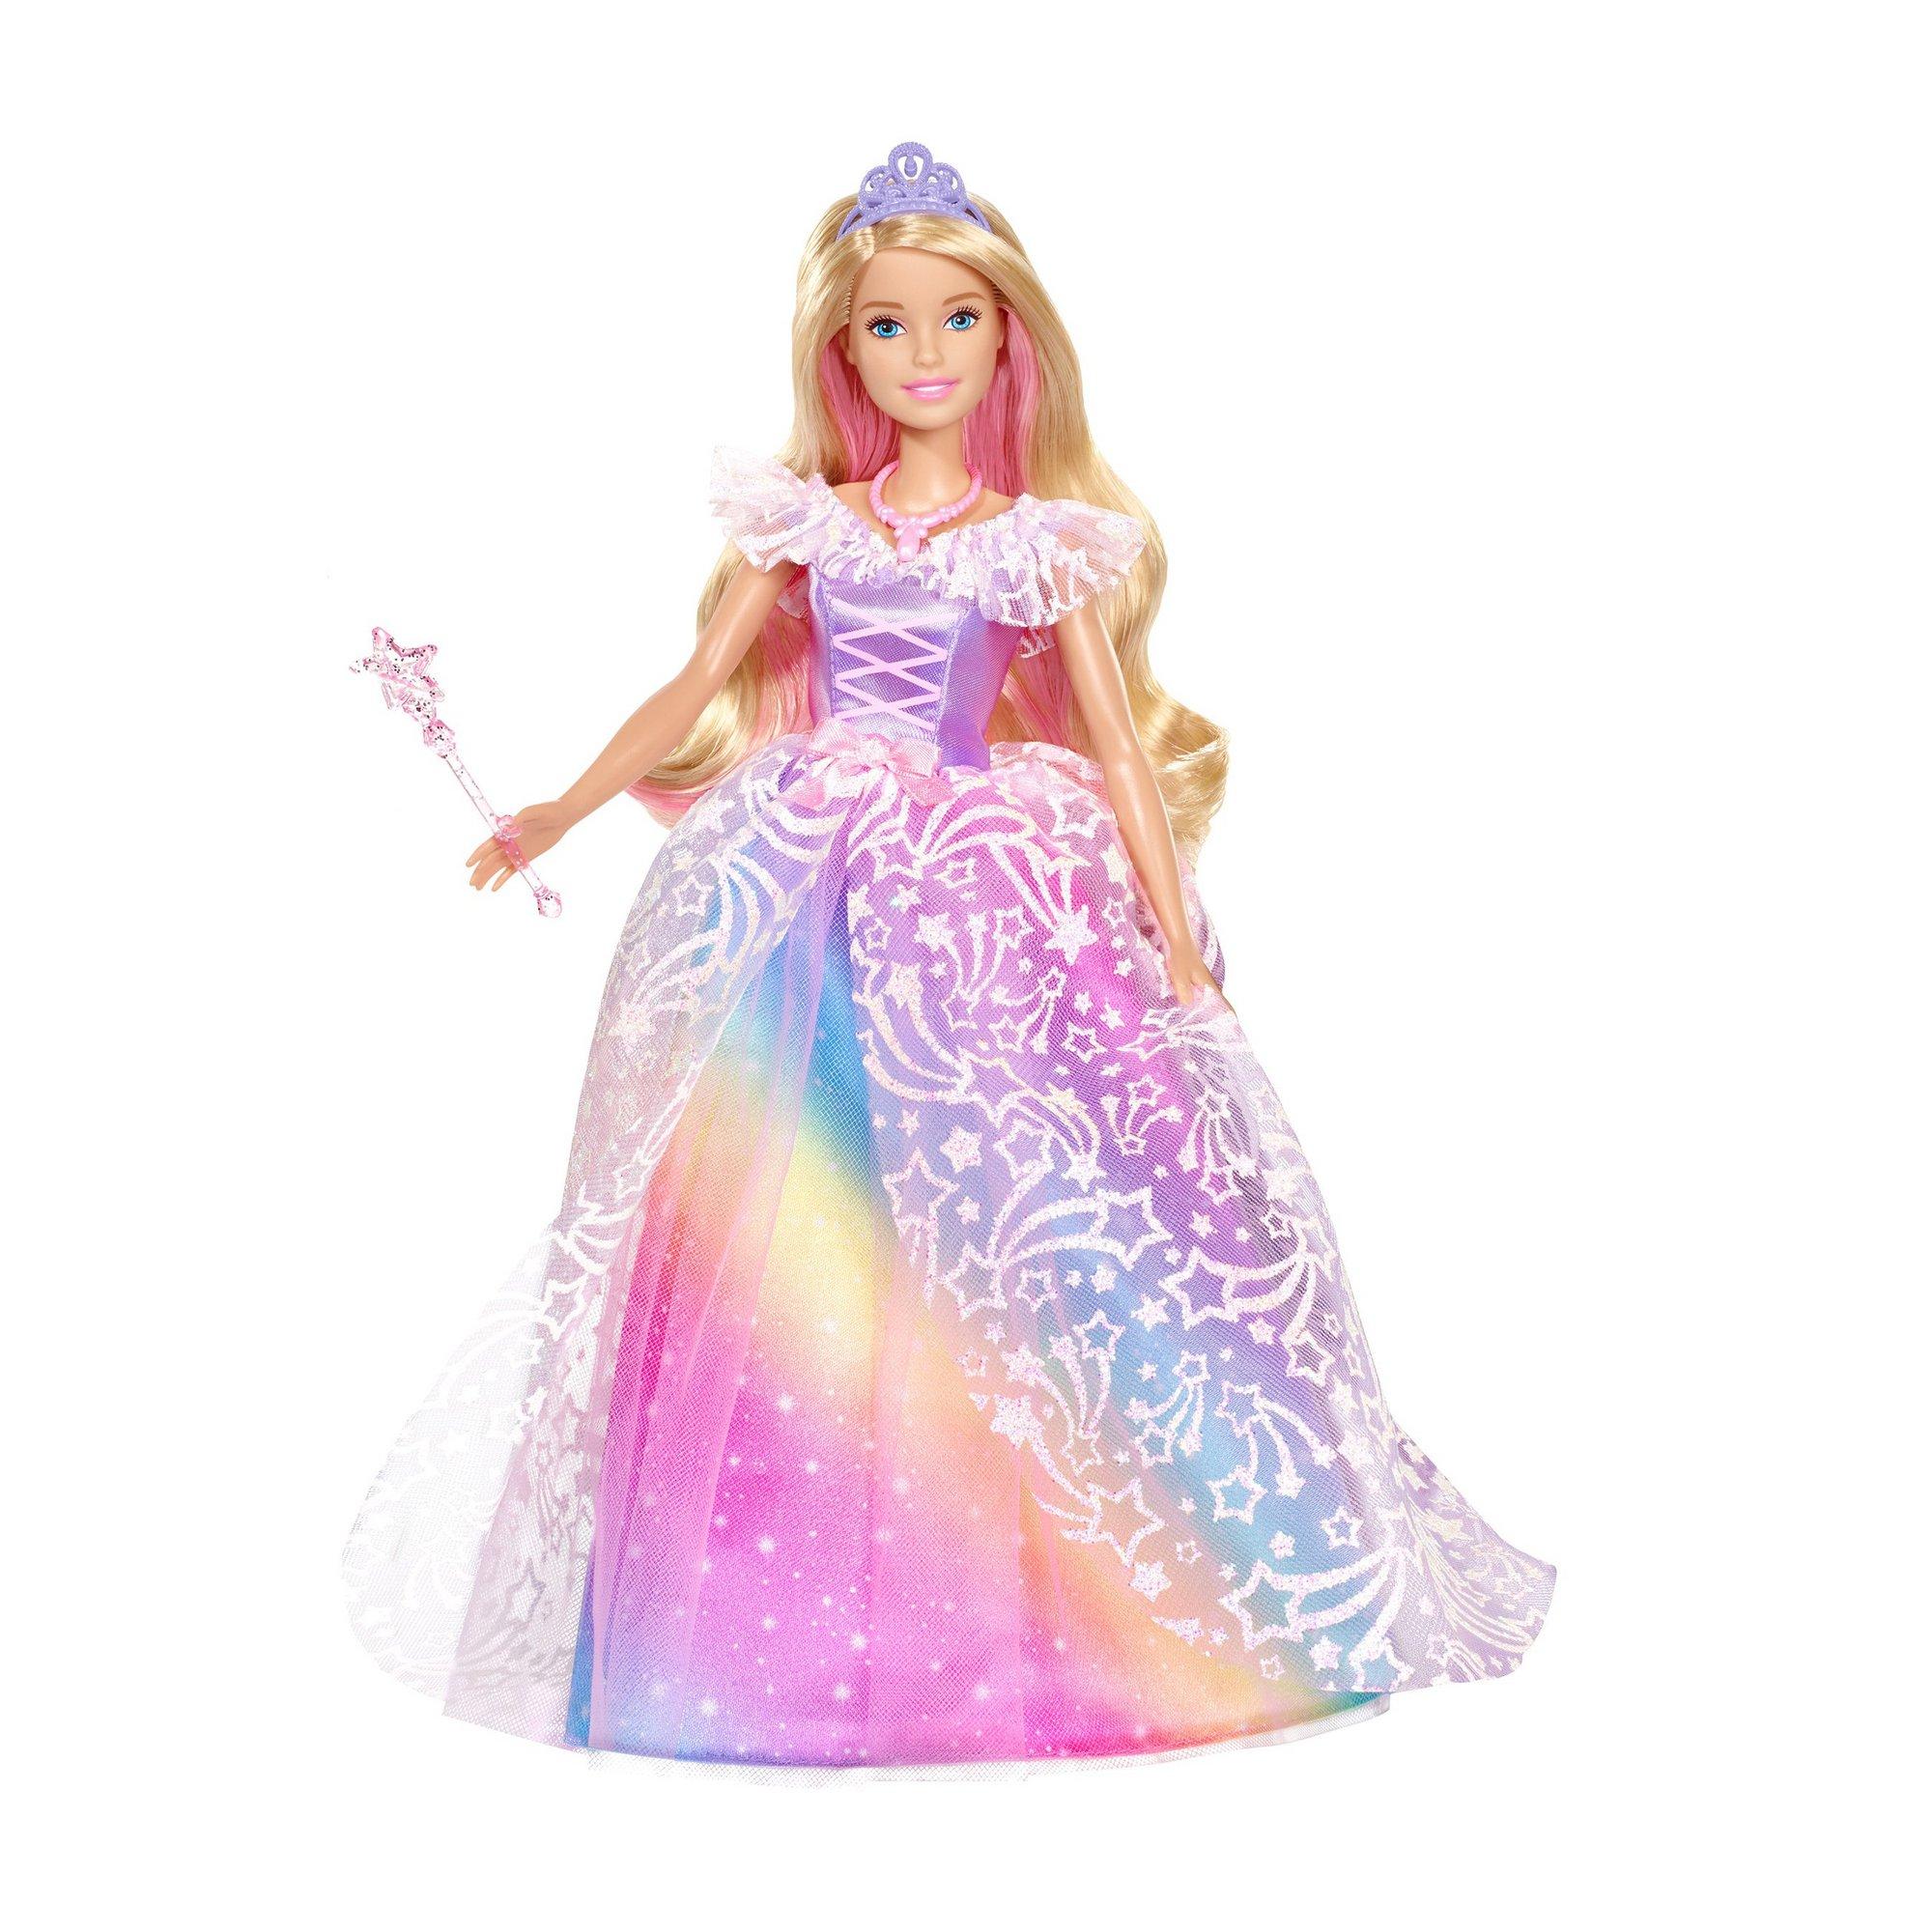 Image of Barbie Dreamtopia Ultimate Princess